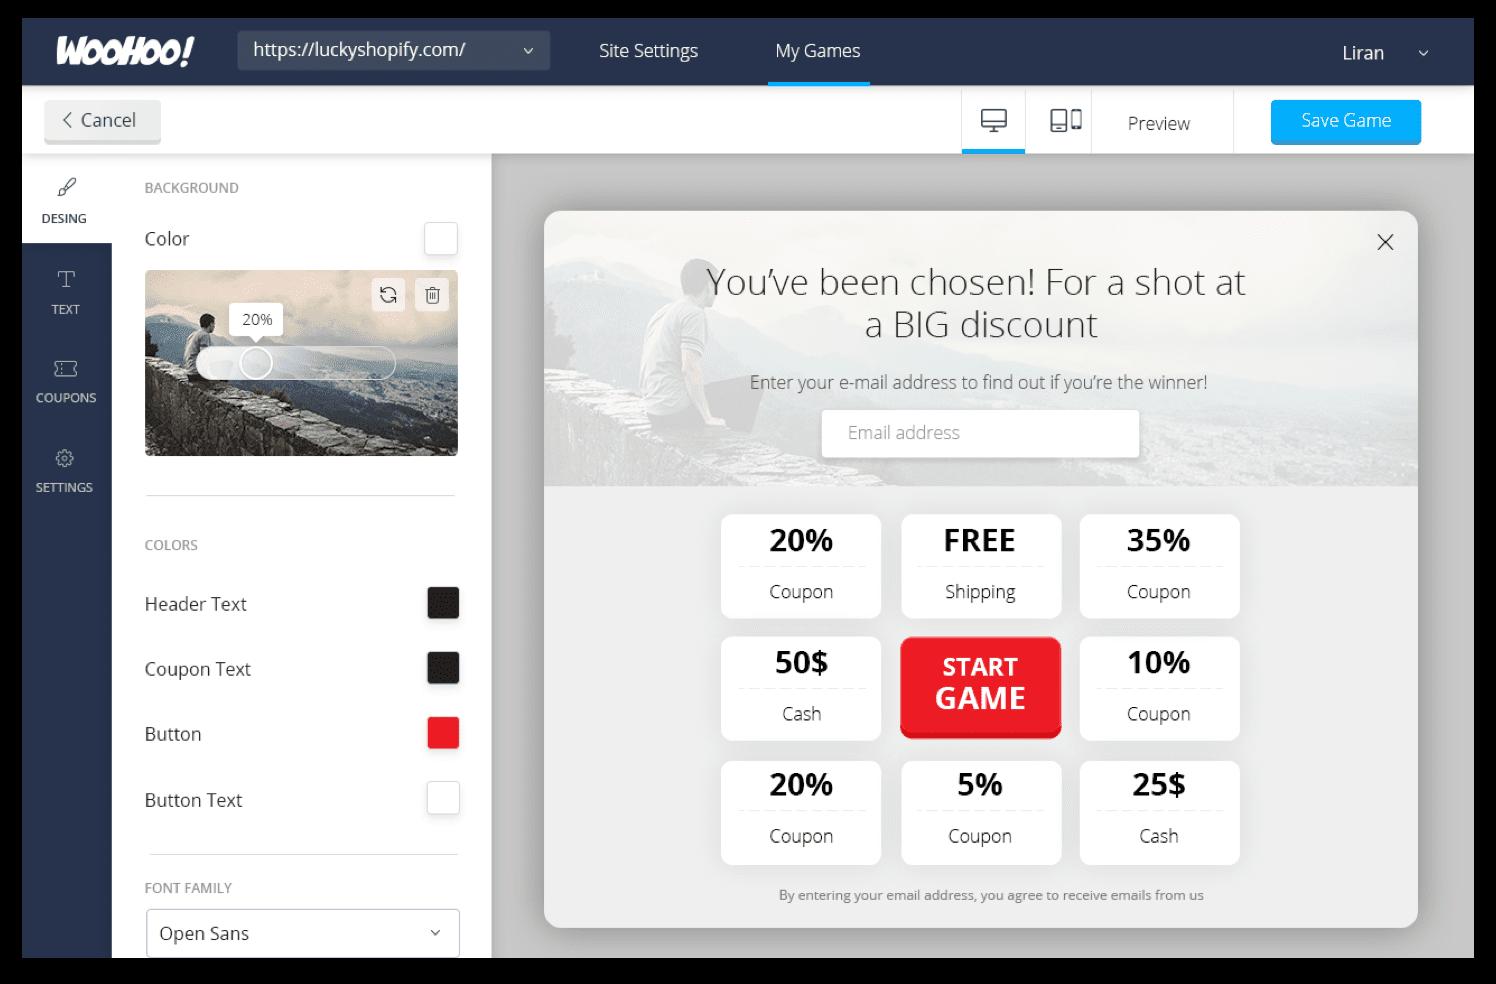 Only Lifetime Deals - WooHoo Premium Plus